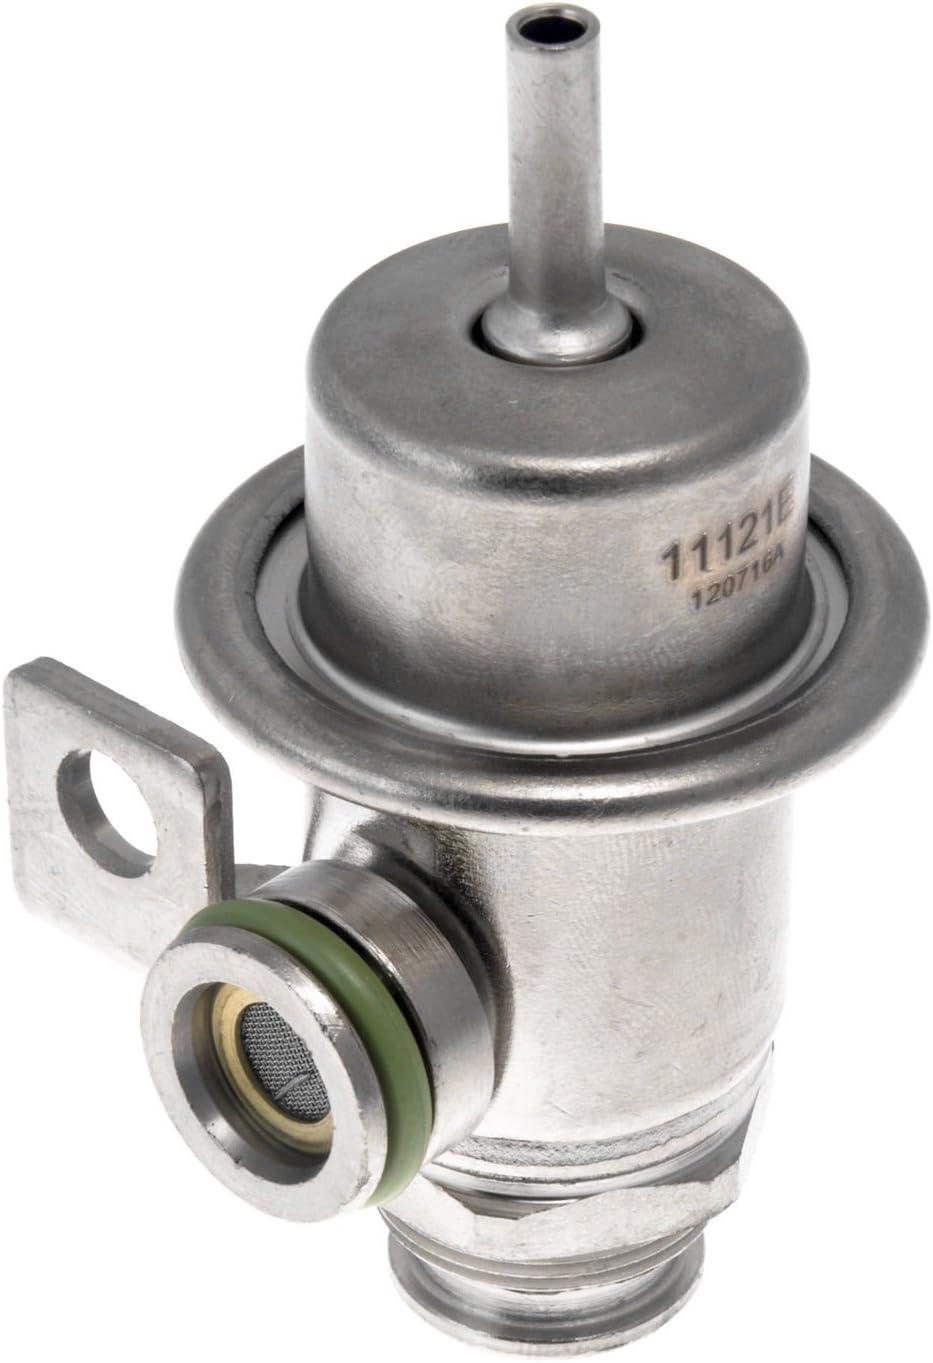 AD Auto Parts Herko Fuel Pressure Regulator PR4105 for Chevrolet Pontiac Oldsmobile 1999-2002